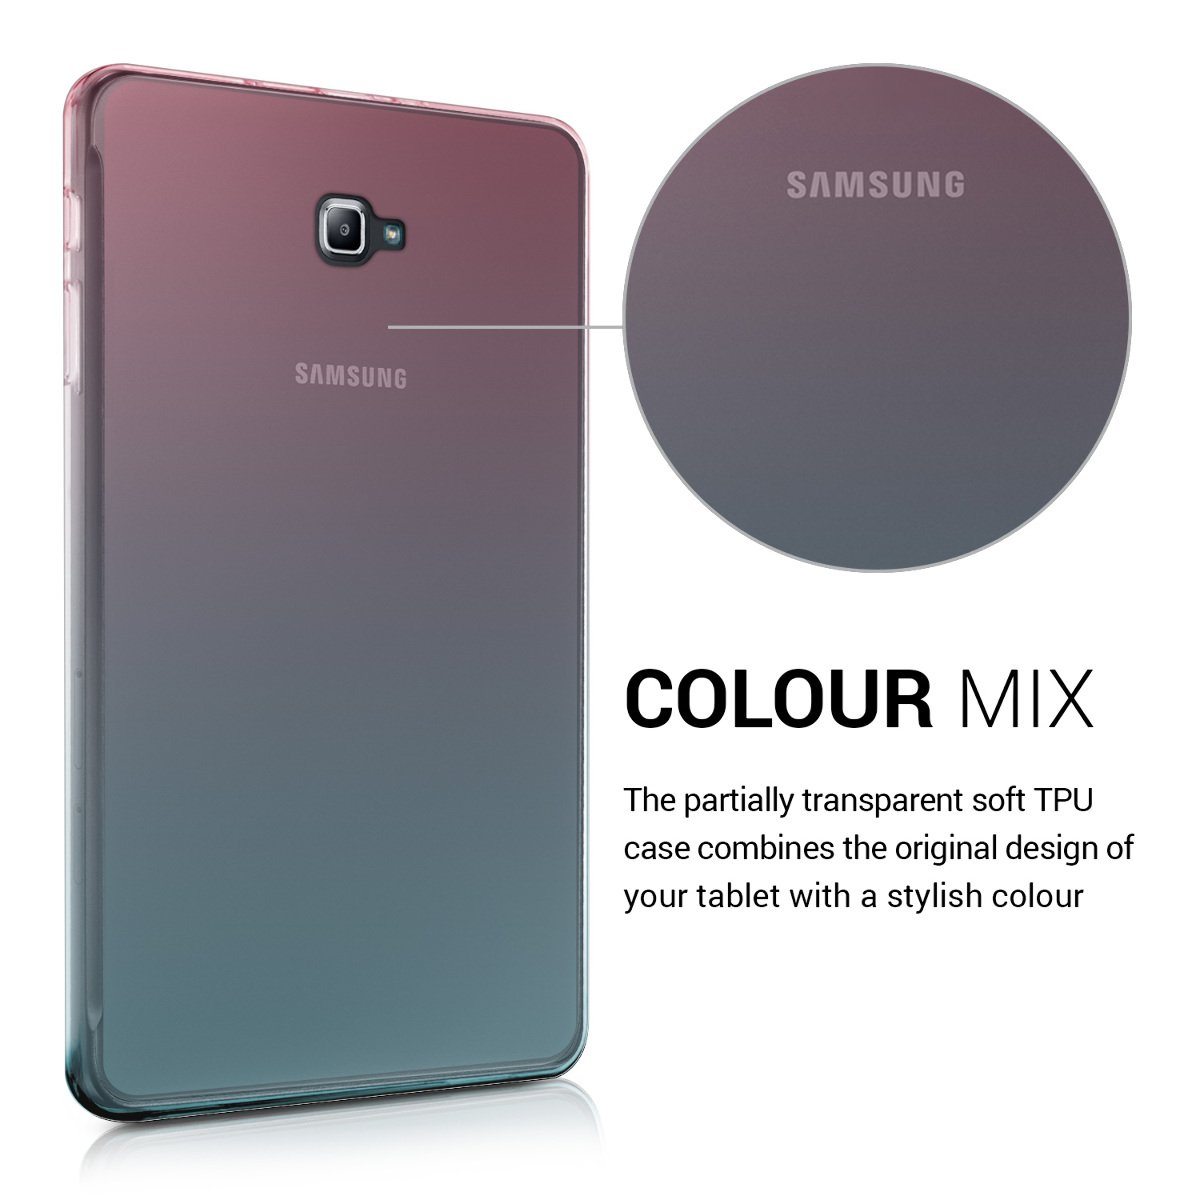 kwmobile Funda compatible con Samsung Galaxy Tab A 10.1 T580N/T585N - Carcasa trasera para tablet de TPU - En rosa fucsia / azul / transparente